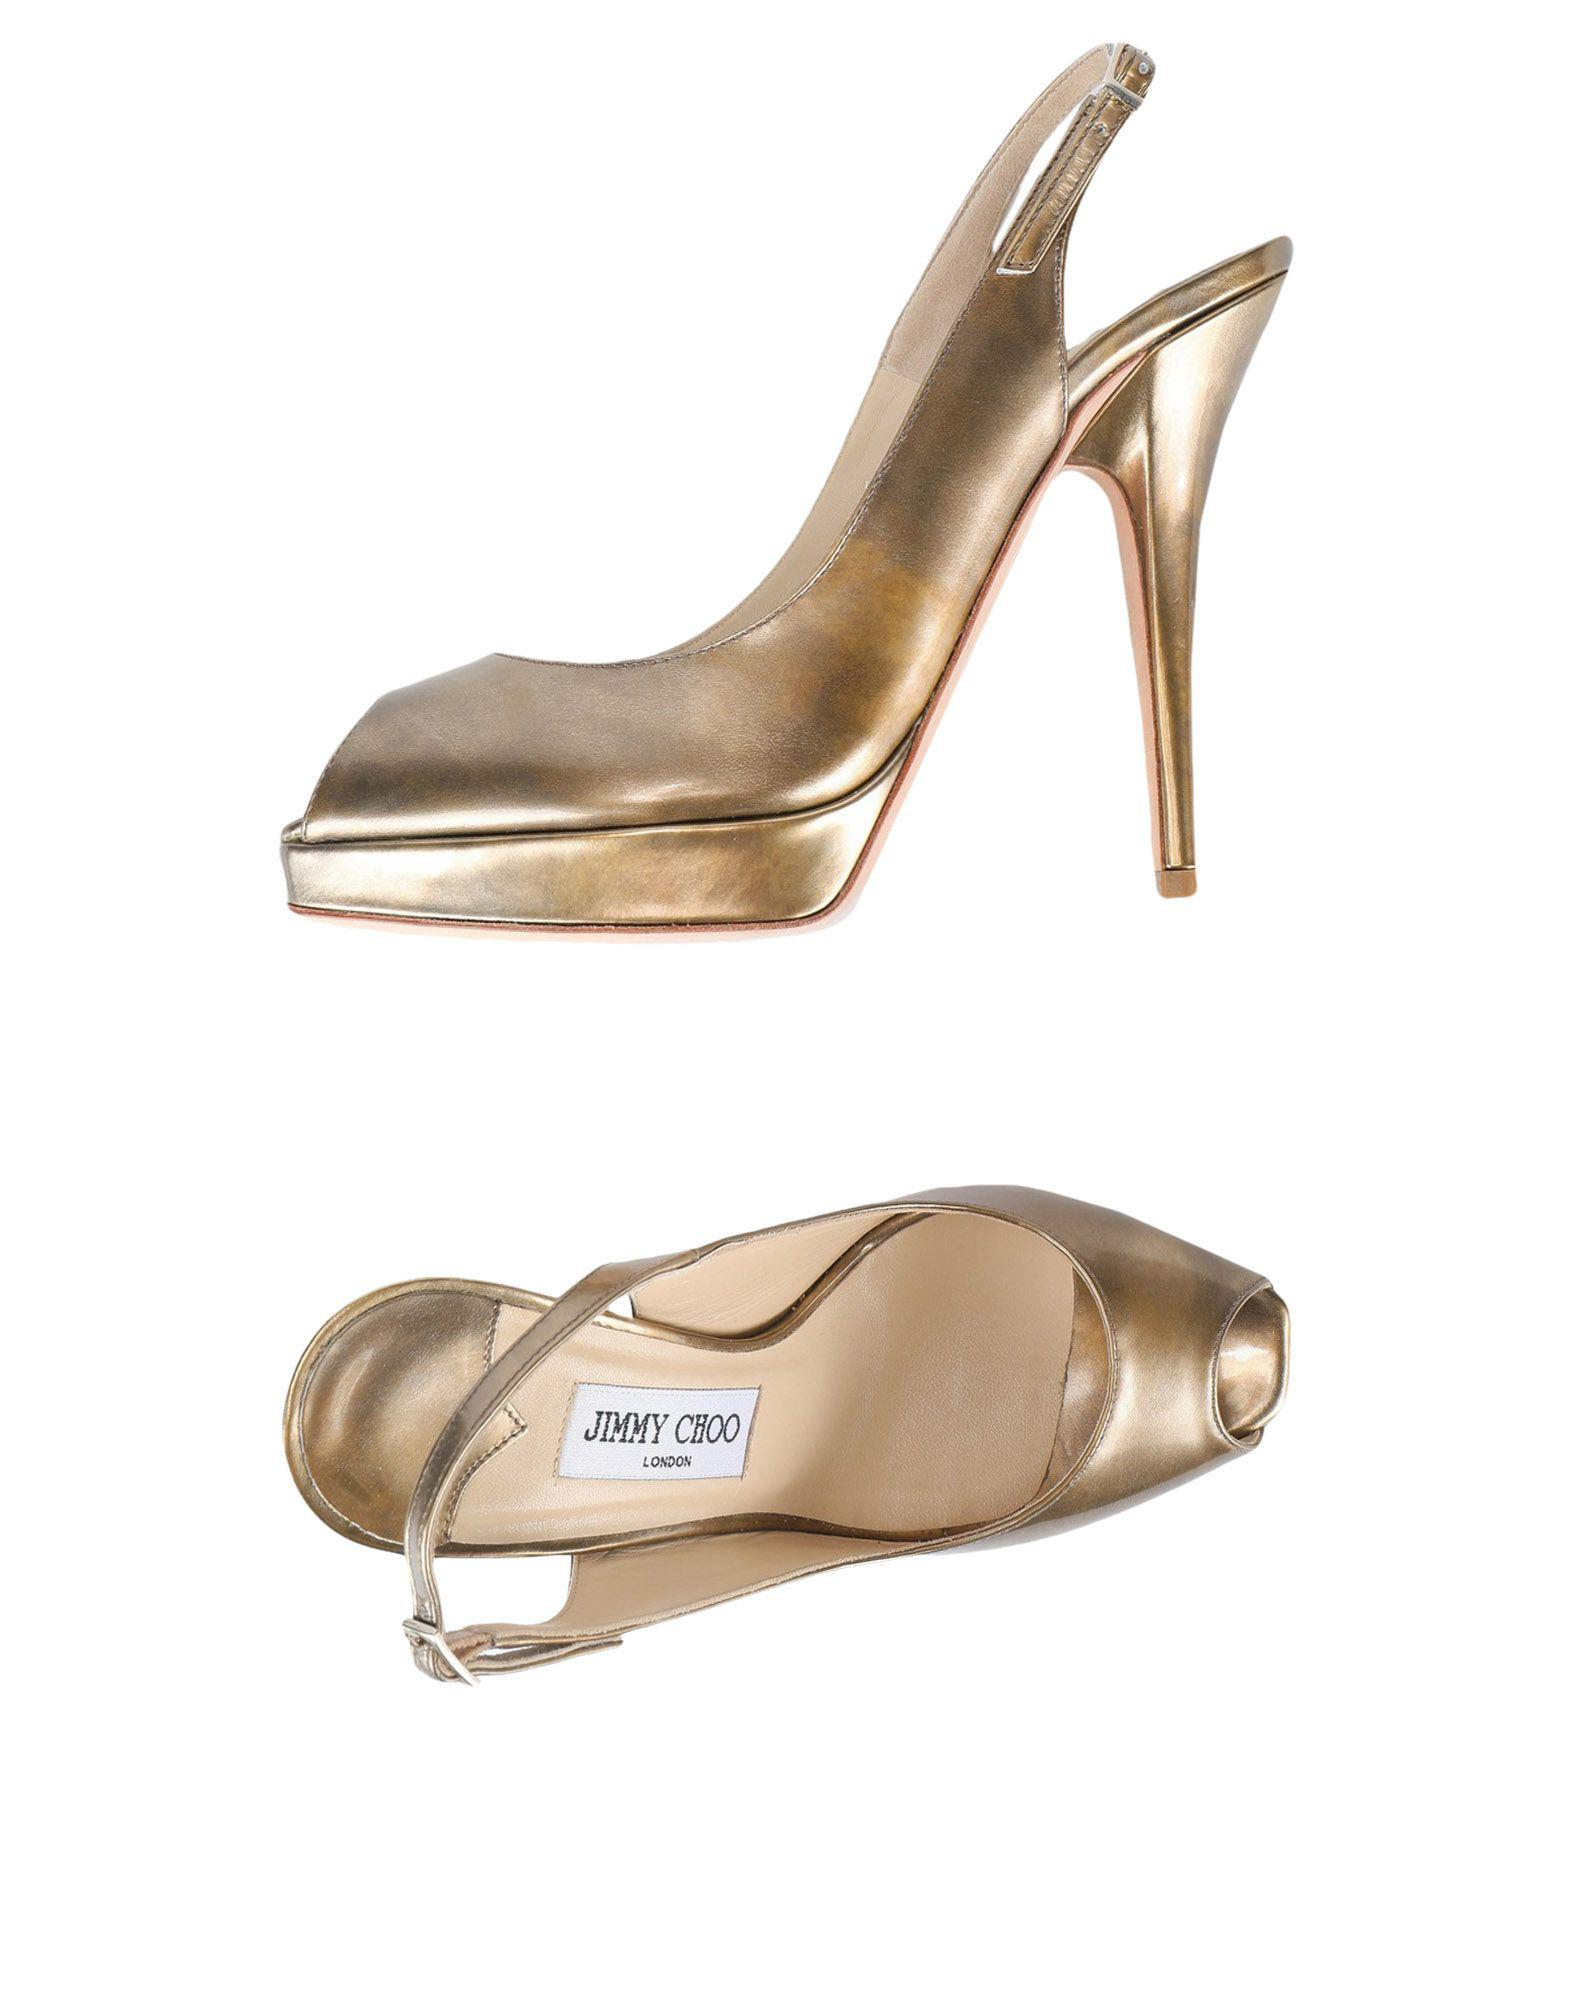 628620e8287 Lyst - Jimmy Choo Sandals in Metallic